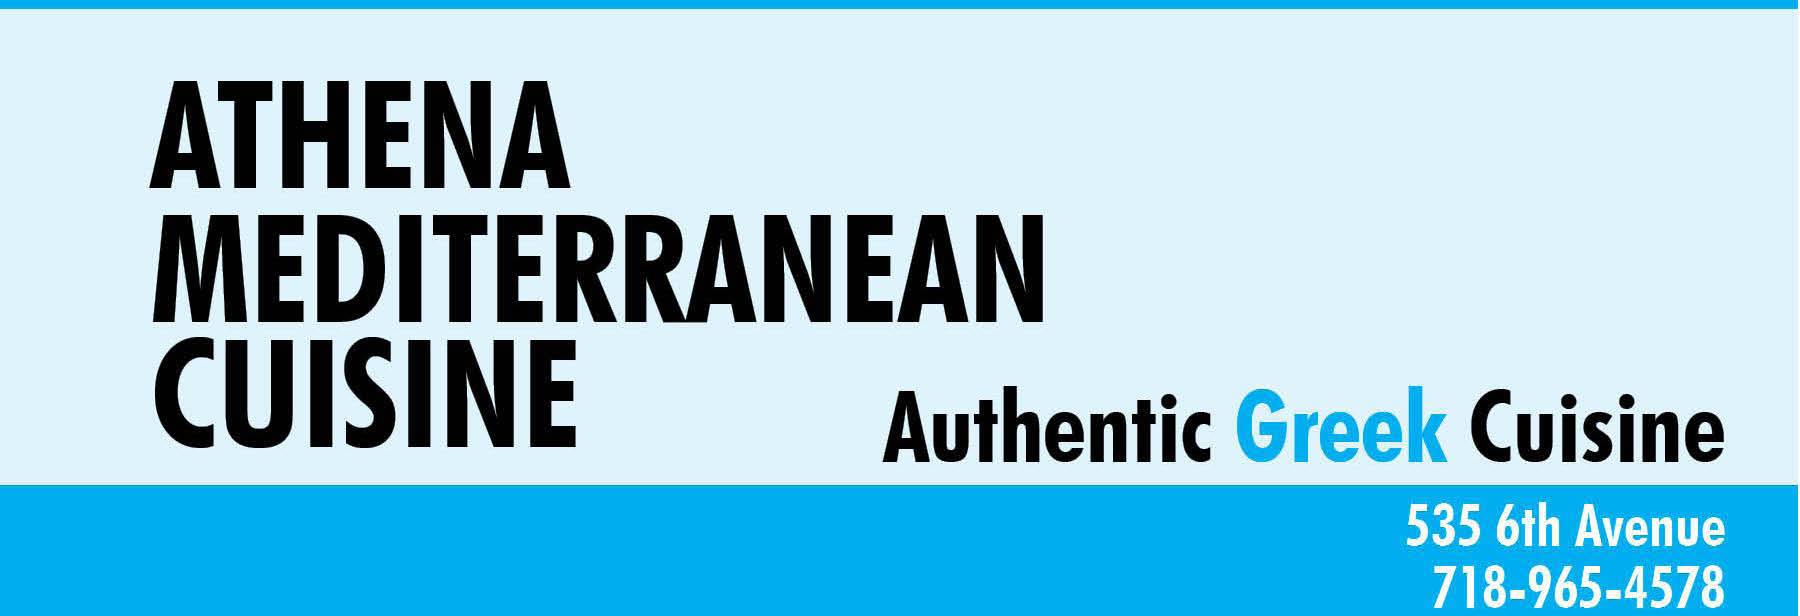 Athena Mediterranean Cuisine in Brooklyn, NY Banner Ad